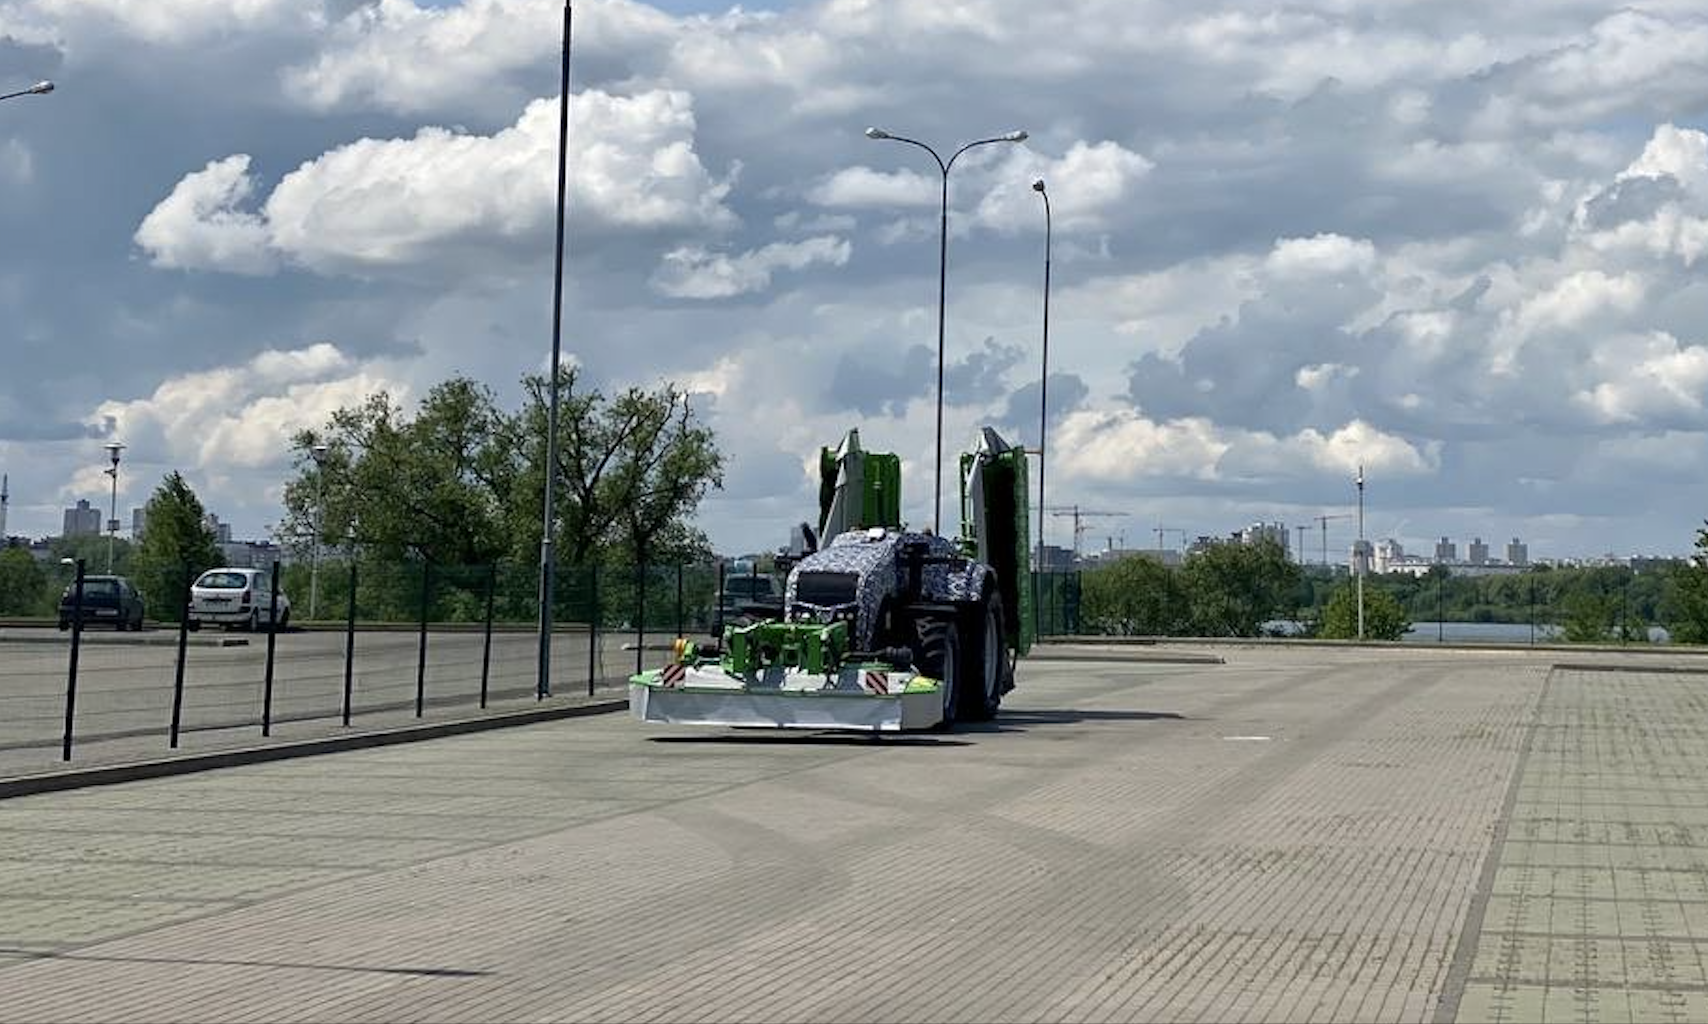 belarus autonomous tractor